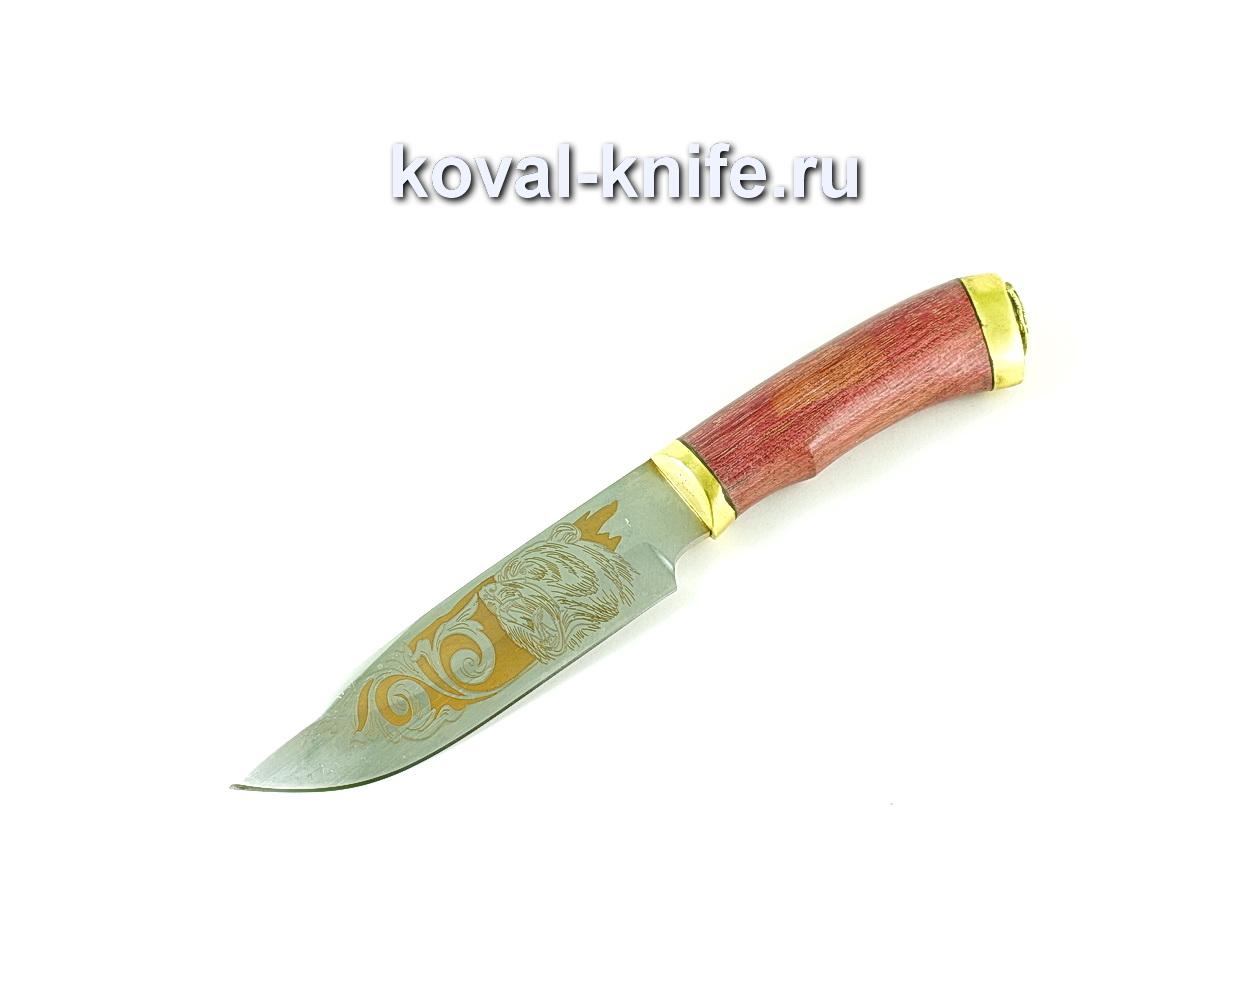 Нож Бигзод (сталь 65х13), рукоять амарант, литье A170